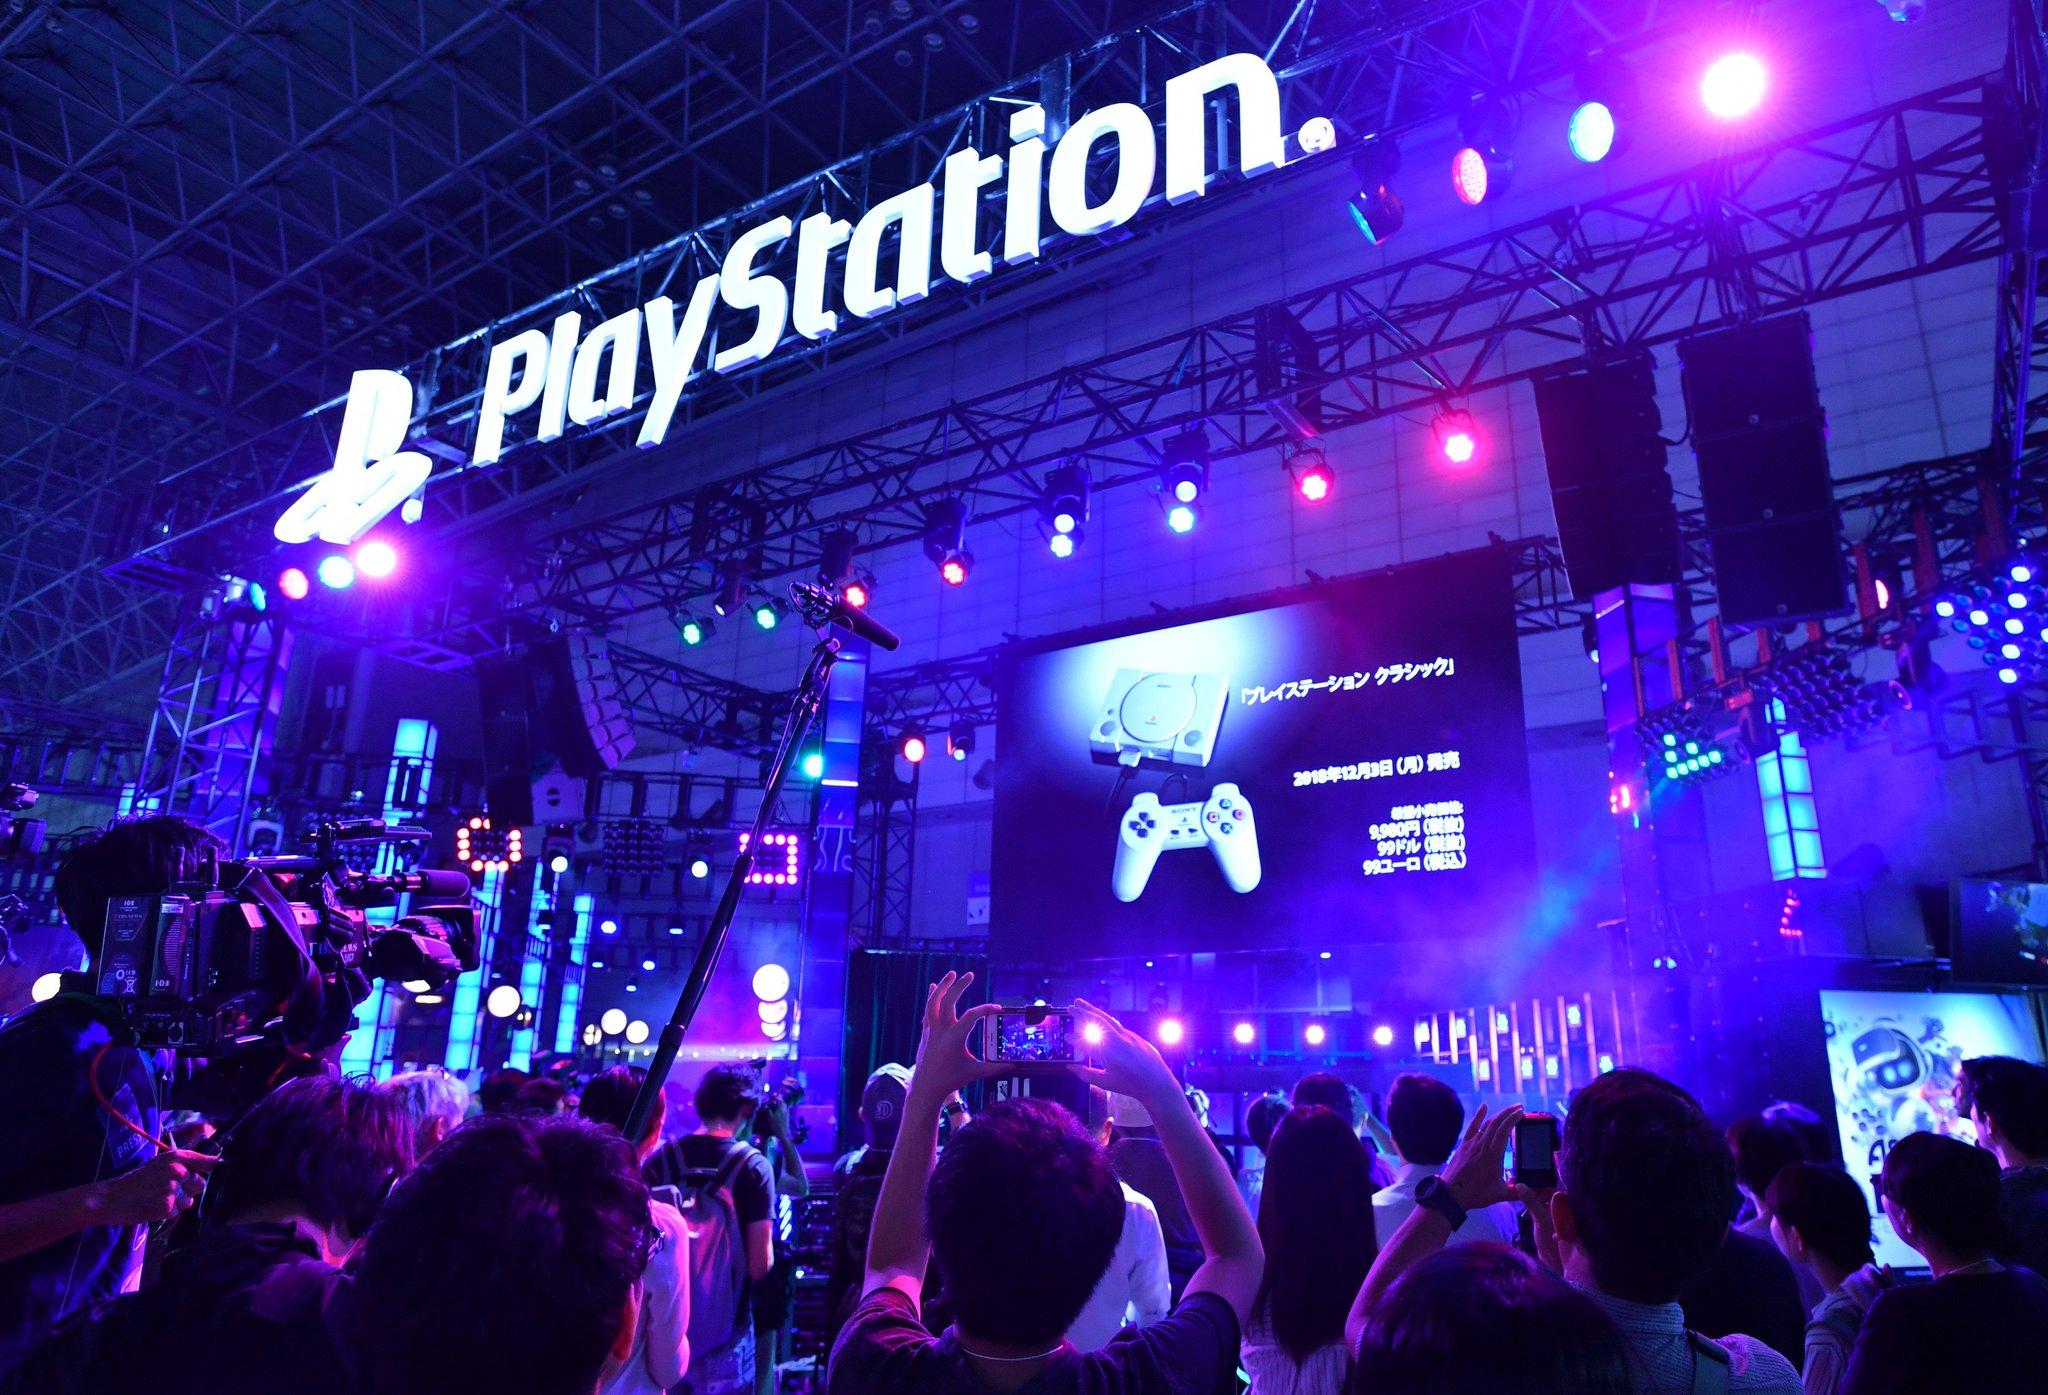 Tokyo Game Show kicks off with stronger esports presence #TGS2018 https://t.co/kVqIpKrF75 https://t.co/mT7VMBEcIr